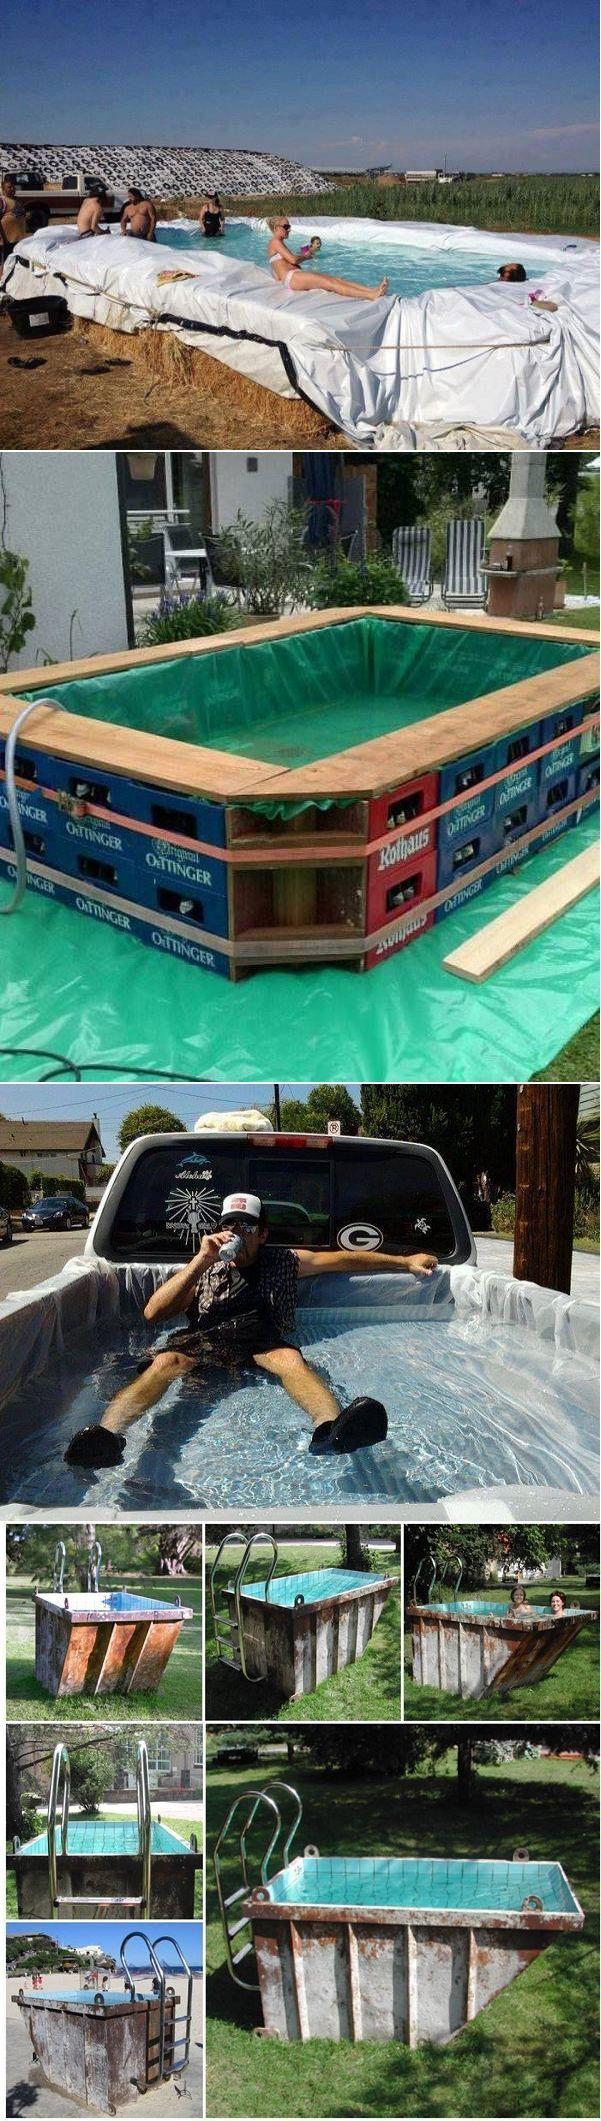 DIY Swimming Pool: Cool and Fun | Redneck Swimming Pools | Pinterest ...